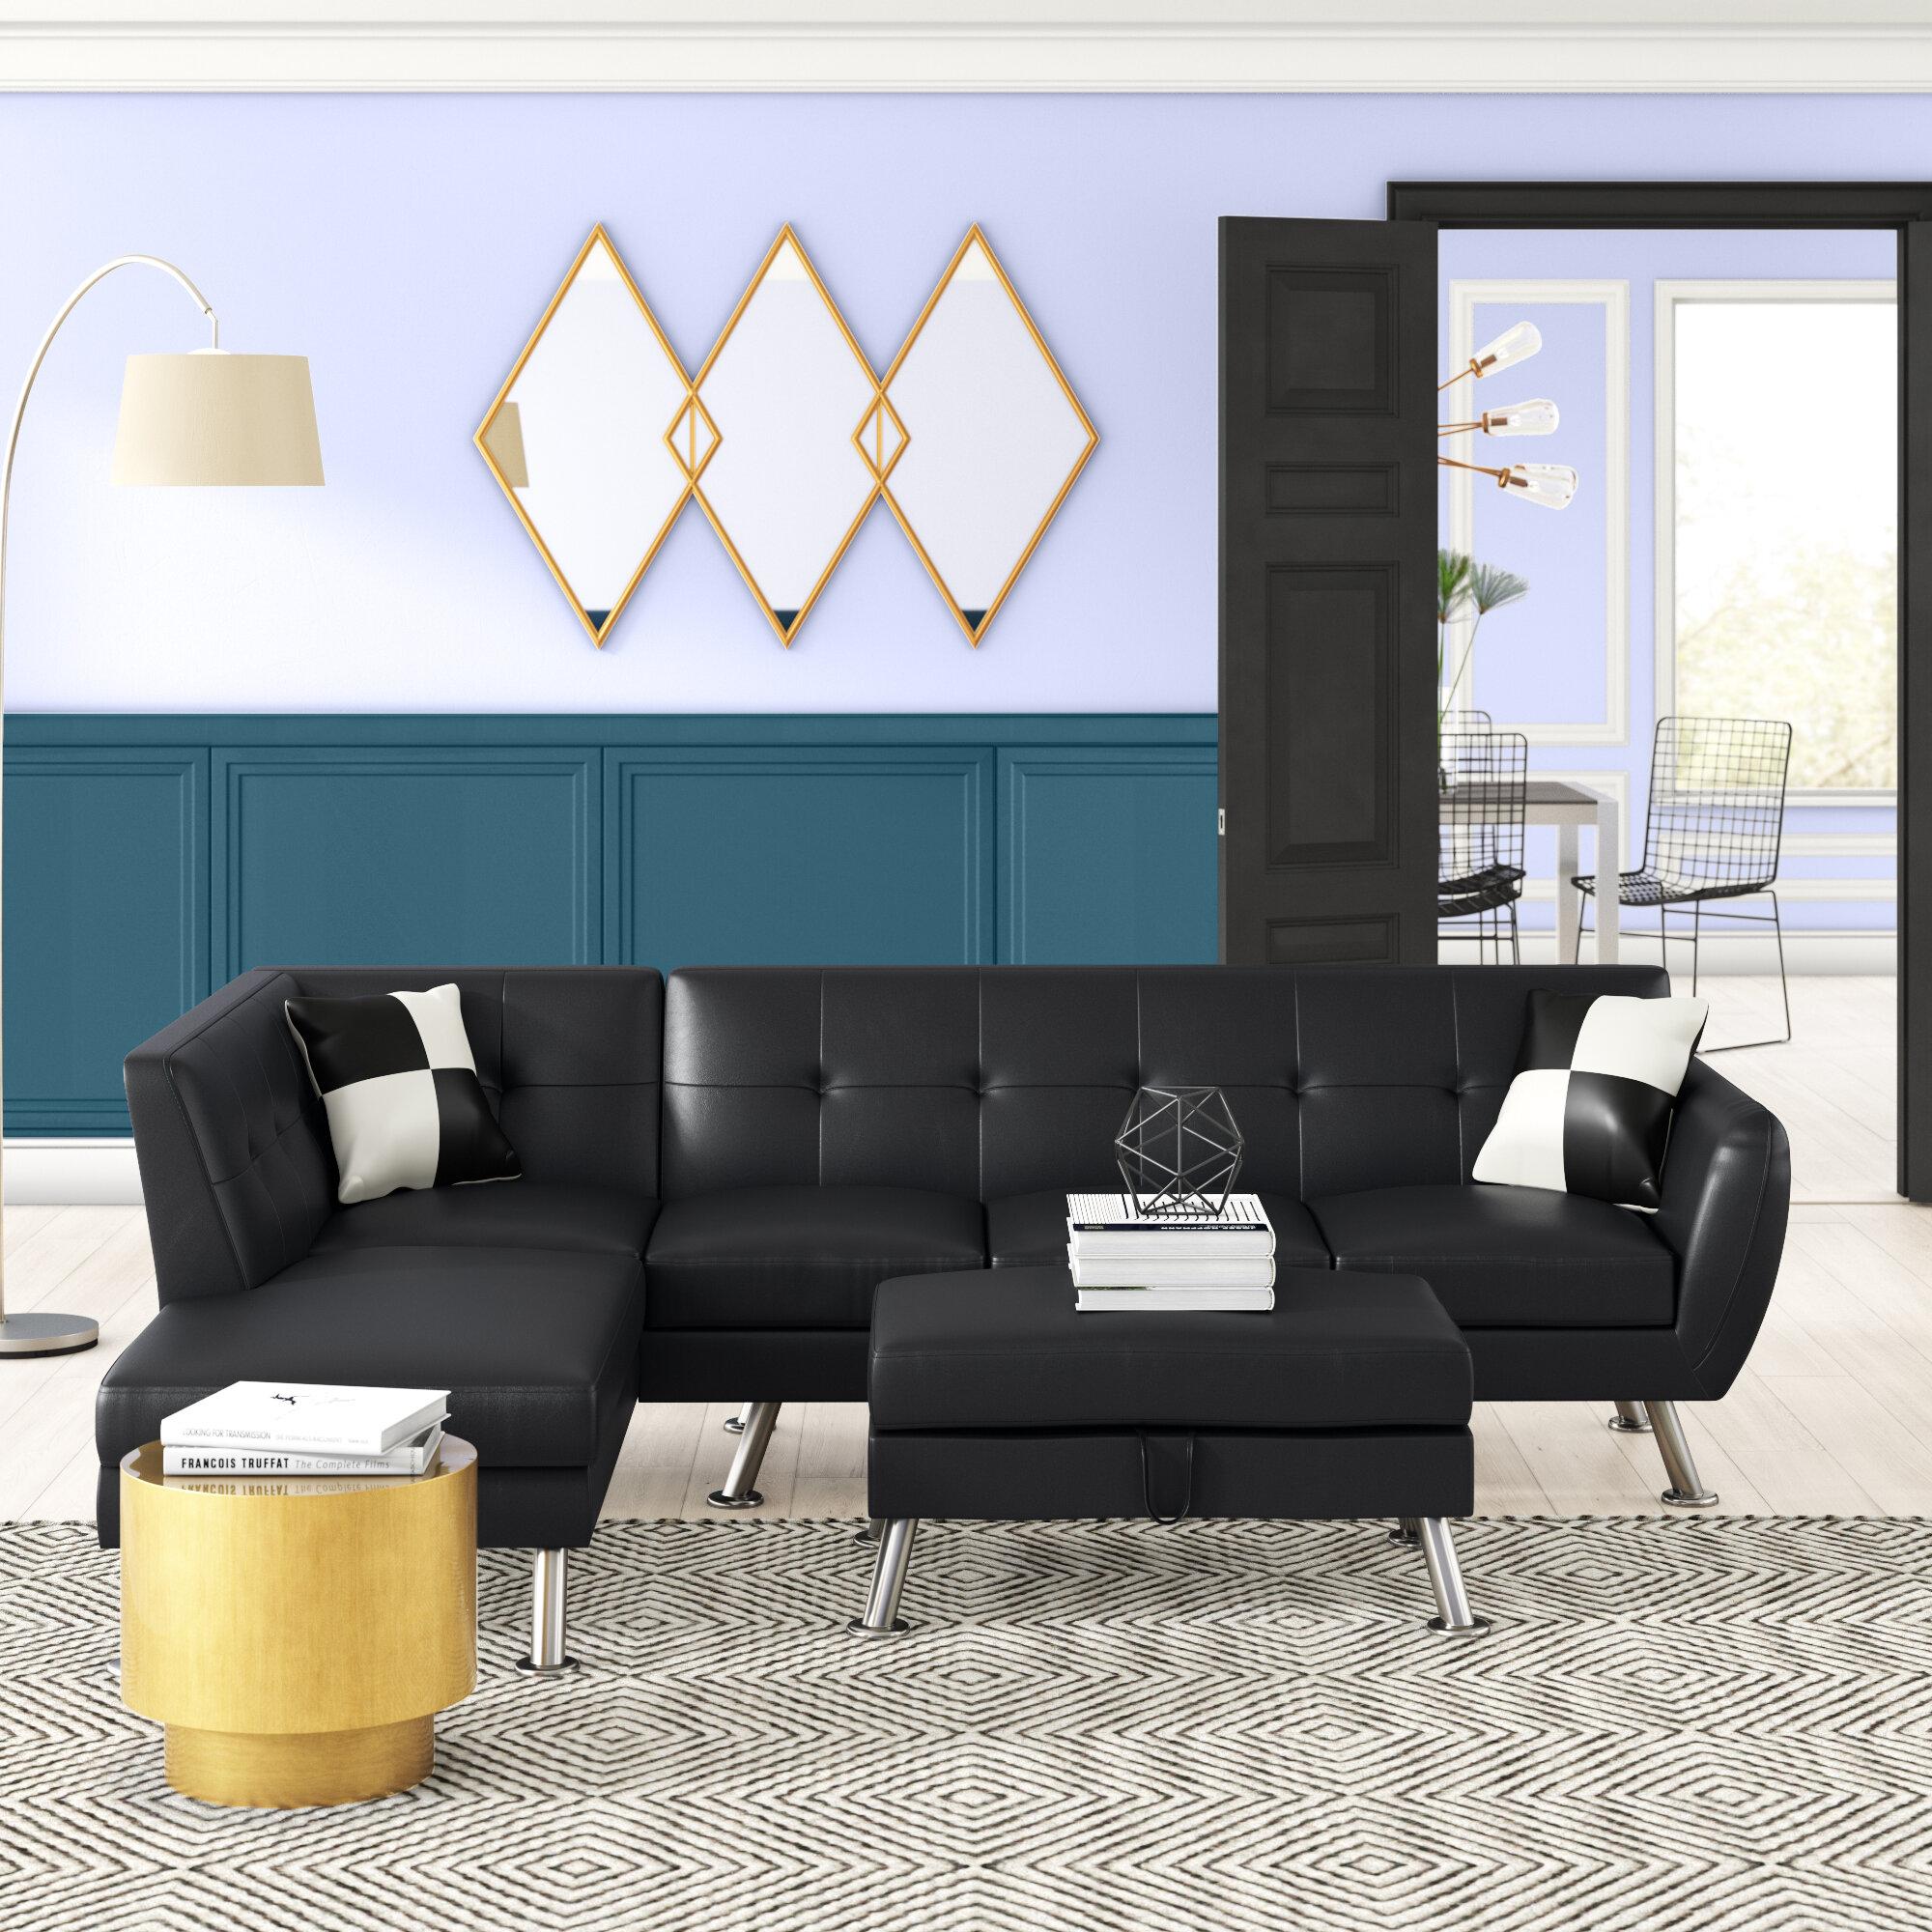 Ebern Designs Jocelynn 103 Faux Leather Modular Sofa Chaise With Ottoman Reviews Wayfair